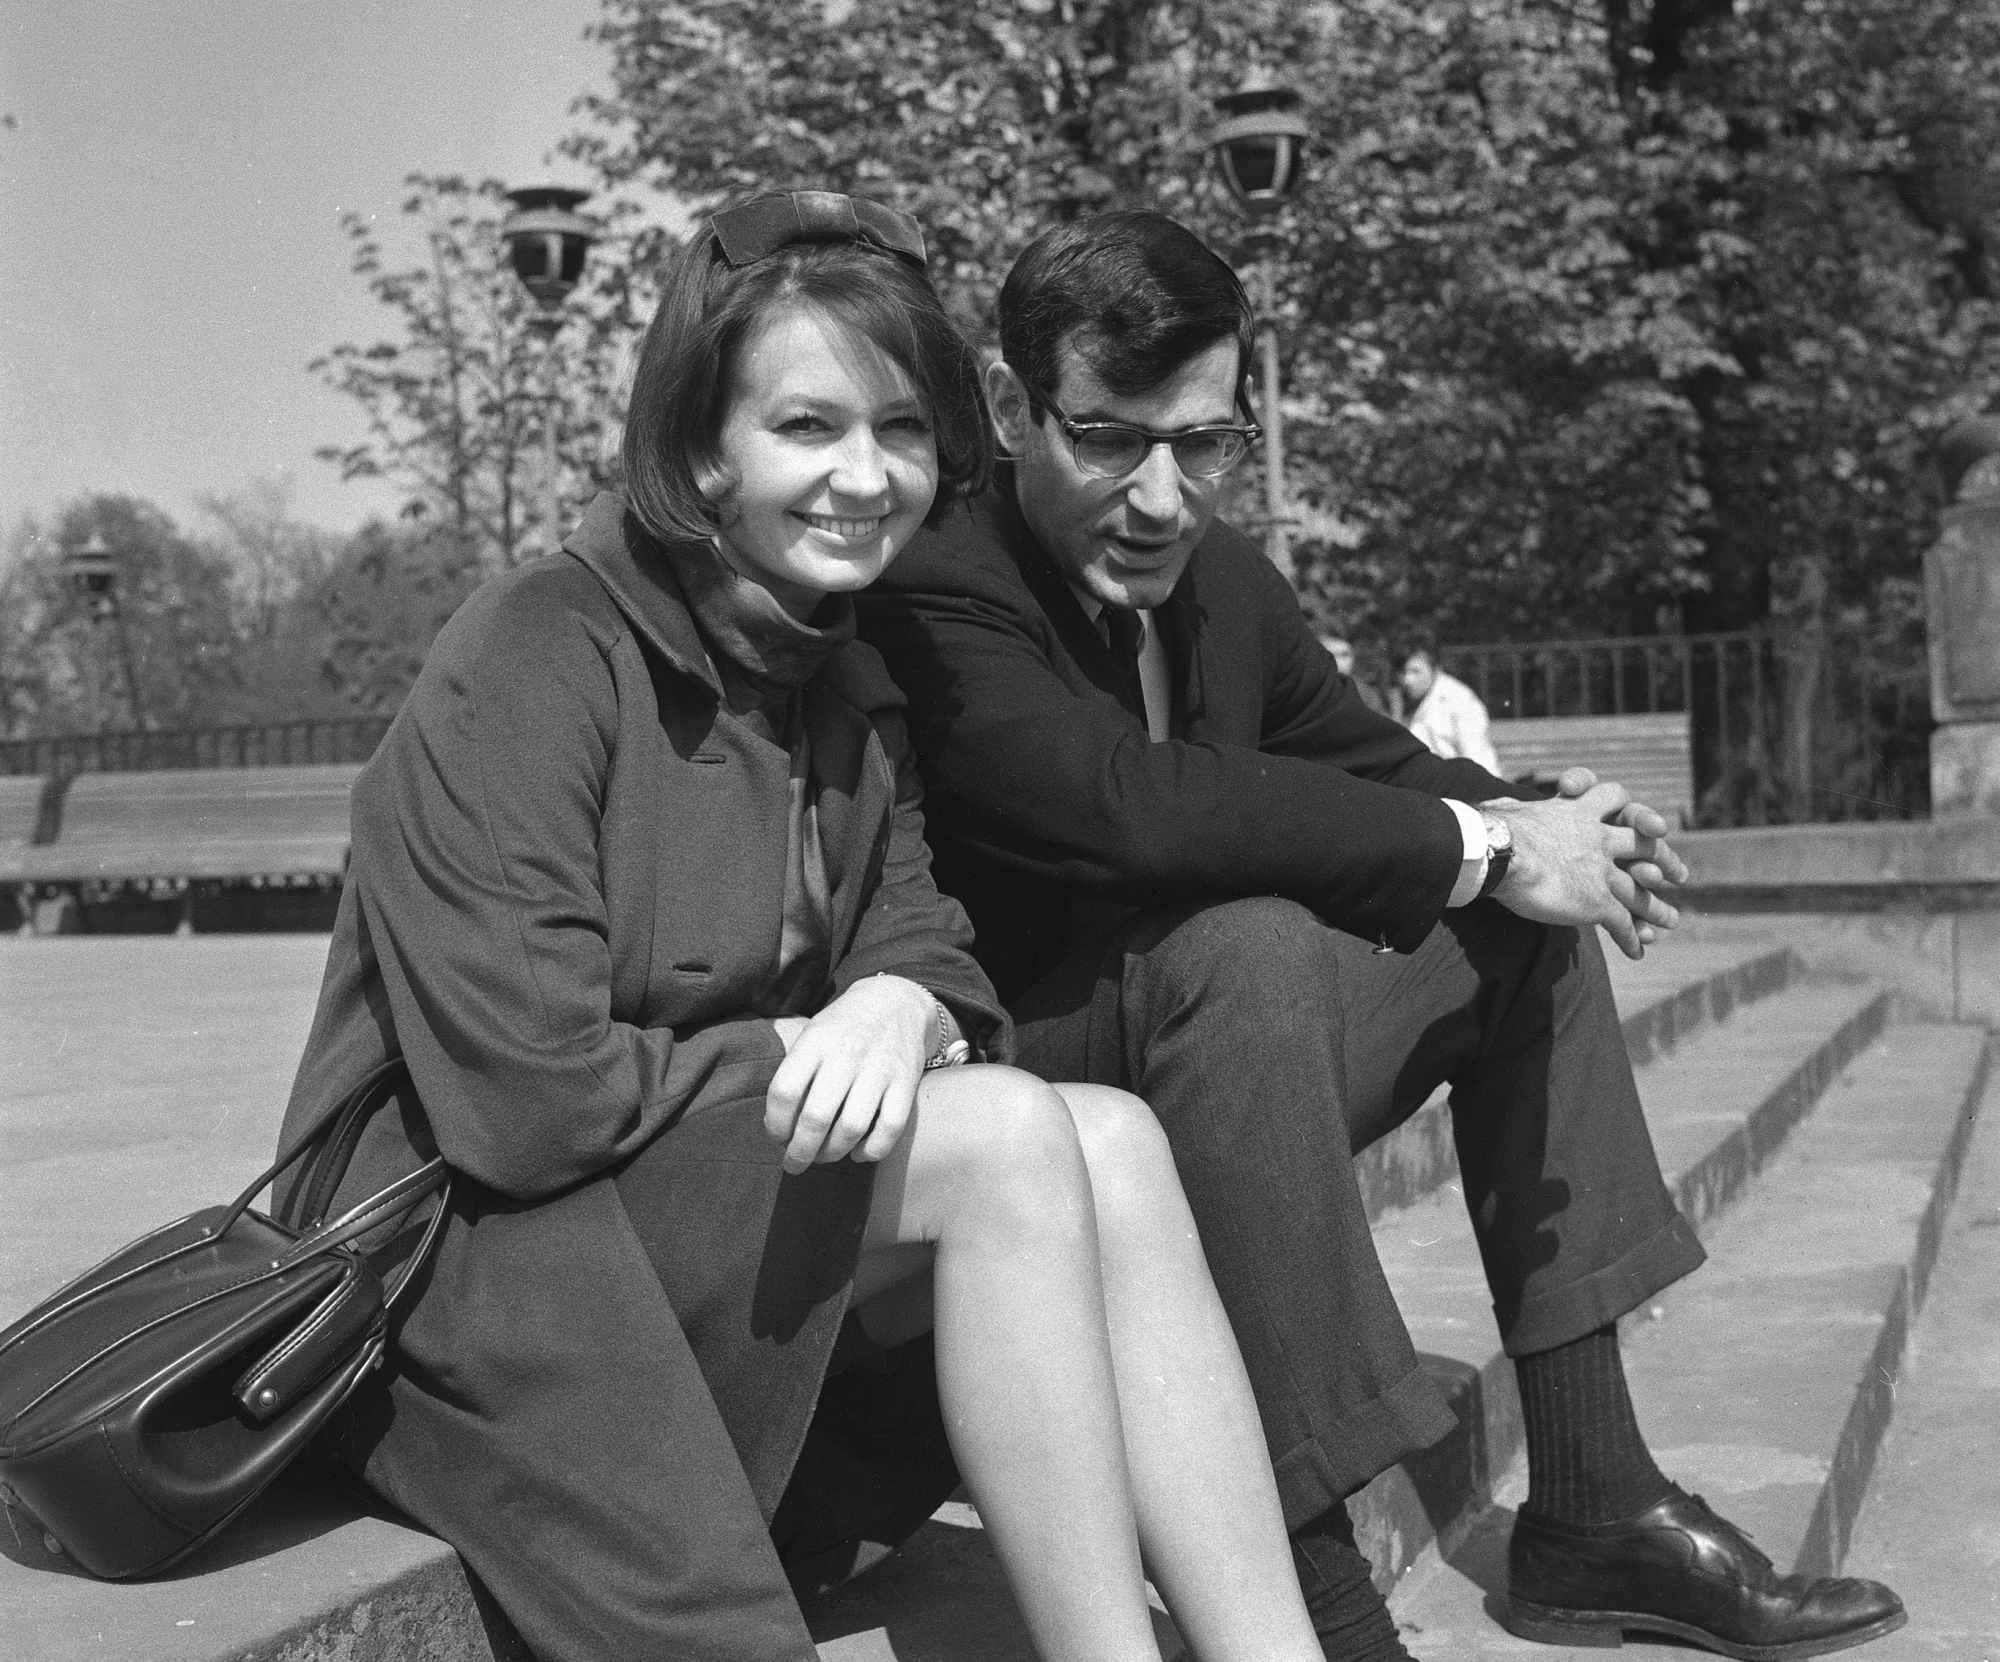 American journalist David Halberstam, right, and his fiancee, Polish actress Elzbieta Czyzewska, sit in Lazienki Park in Warsaw, Poland, on May 15, 1965.  (AP Photo)